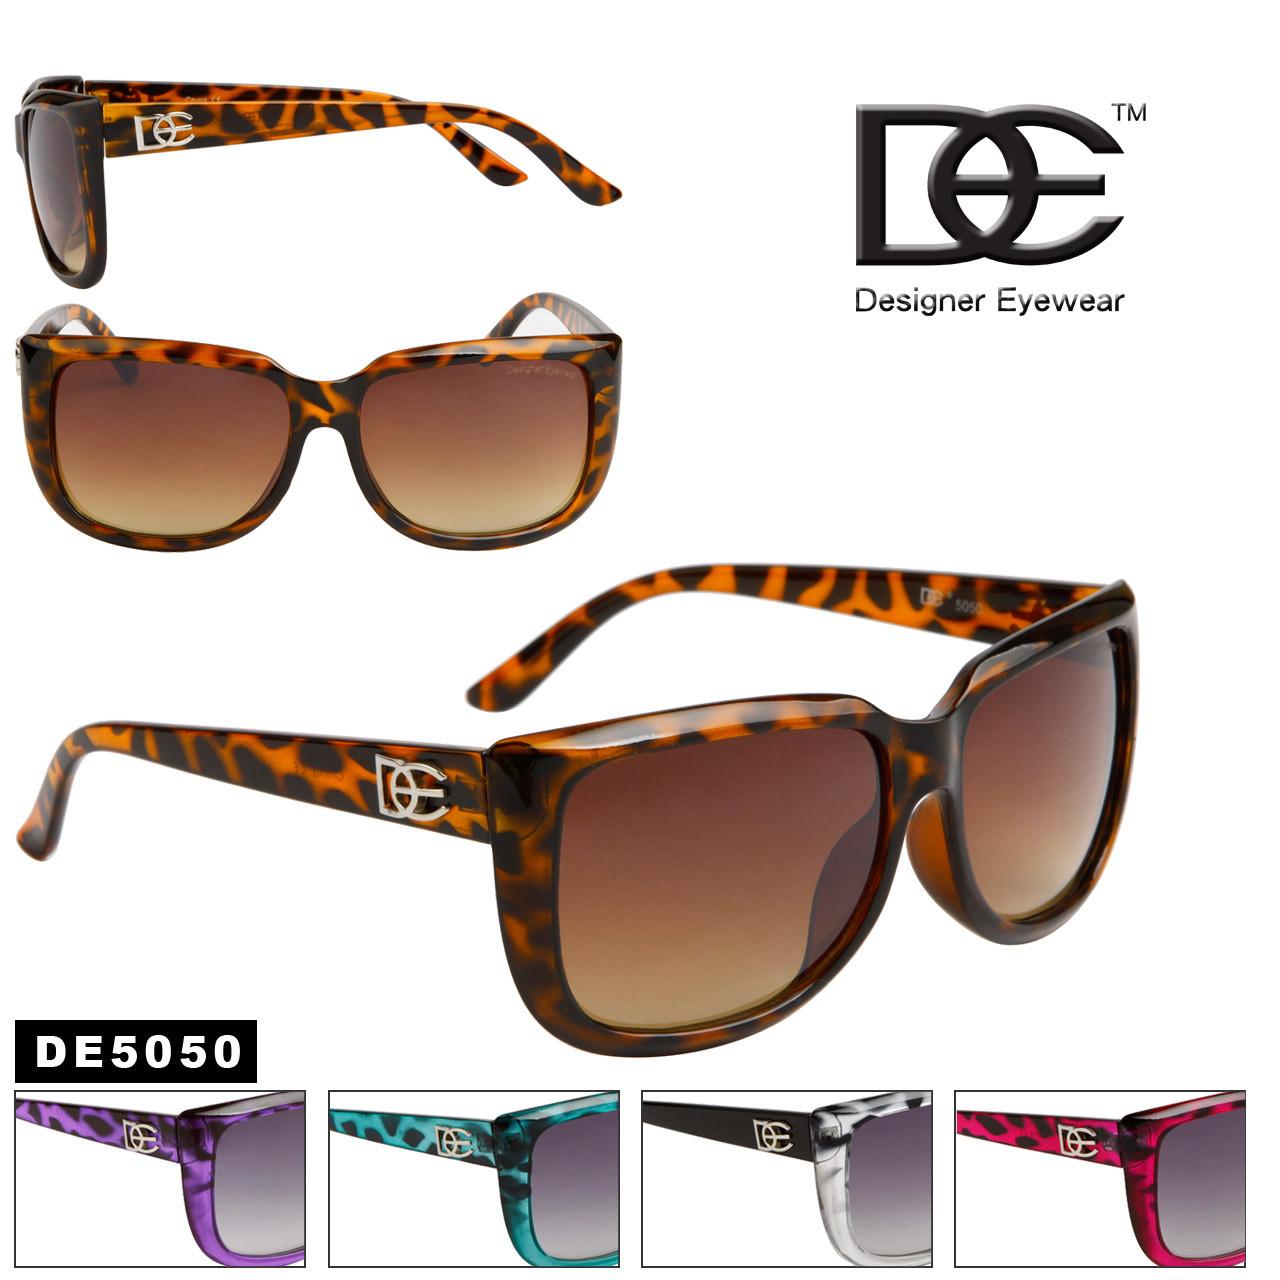 Women's Designer Sunglasses Wholesale DE5050